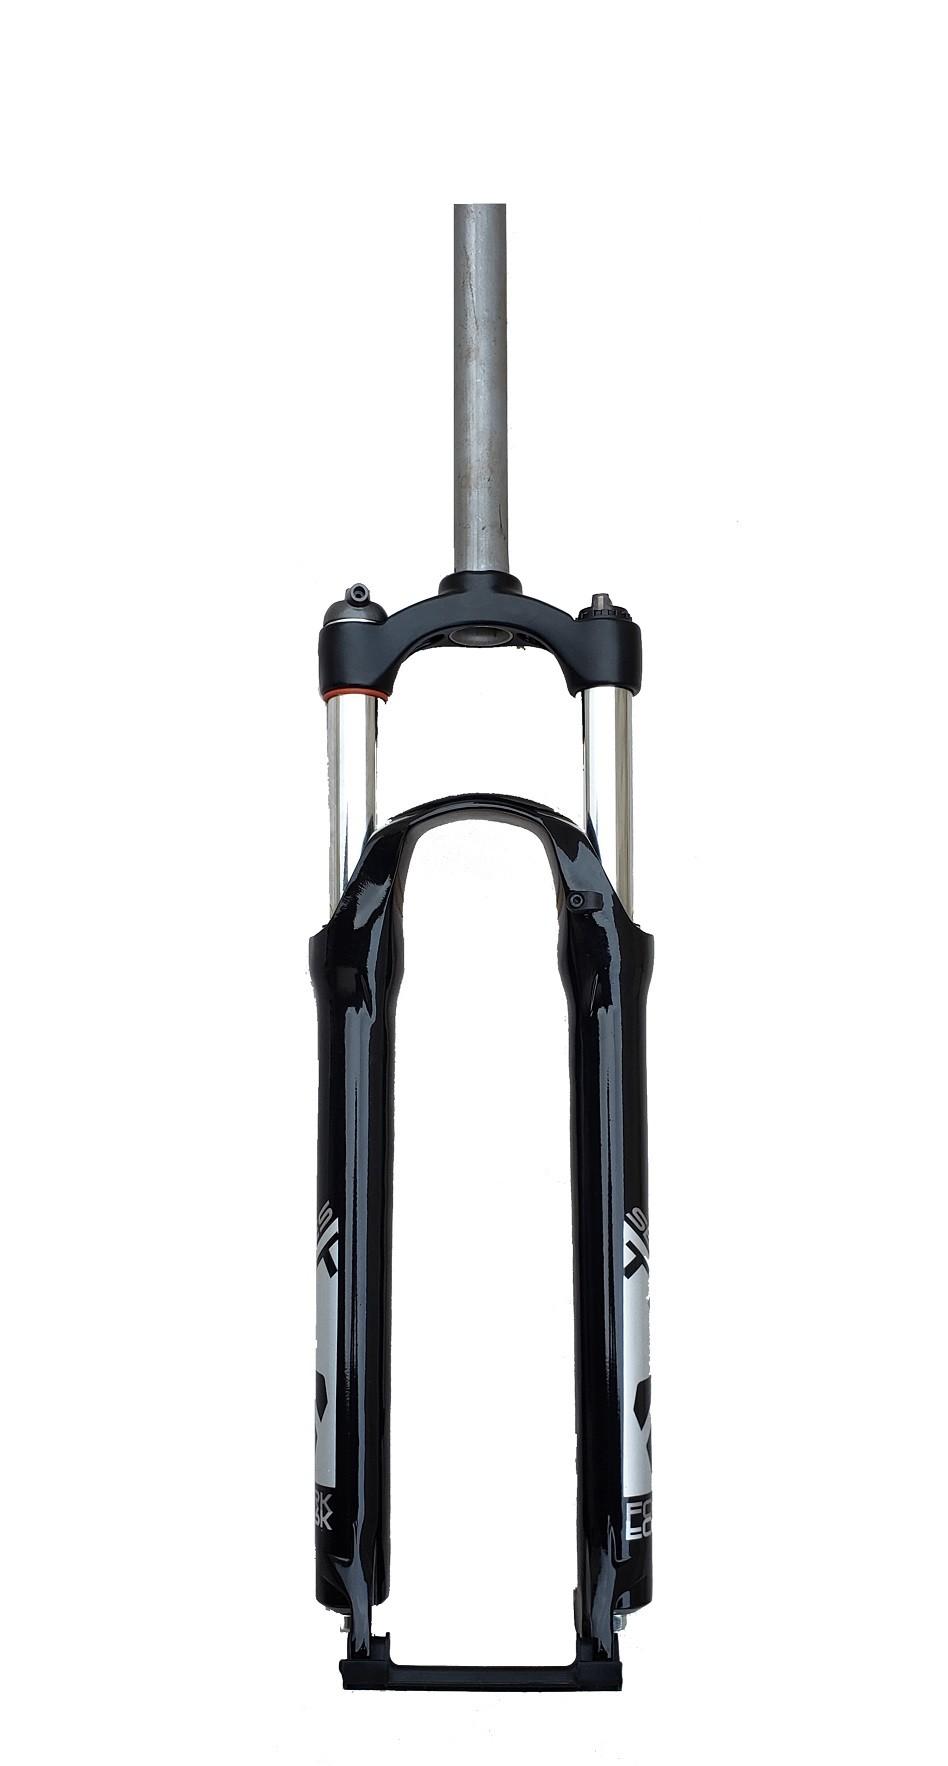 Suspensão Bicicleta MTB Aro 29 TYT c/ Trava Remota Curso 100mm  - Calil Sport Bike